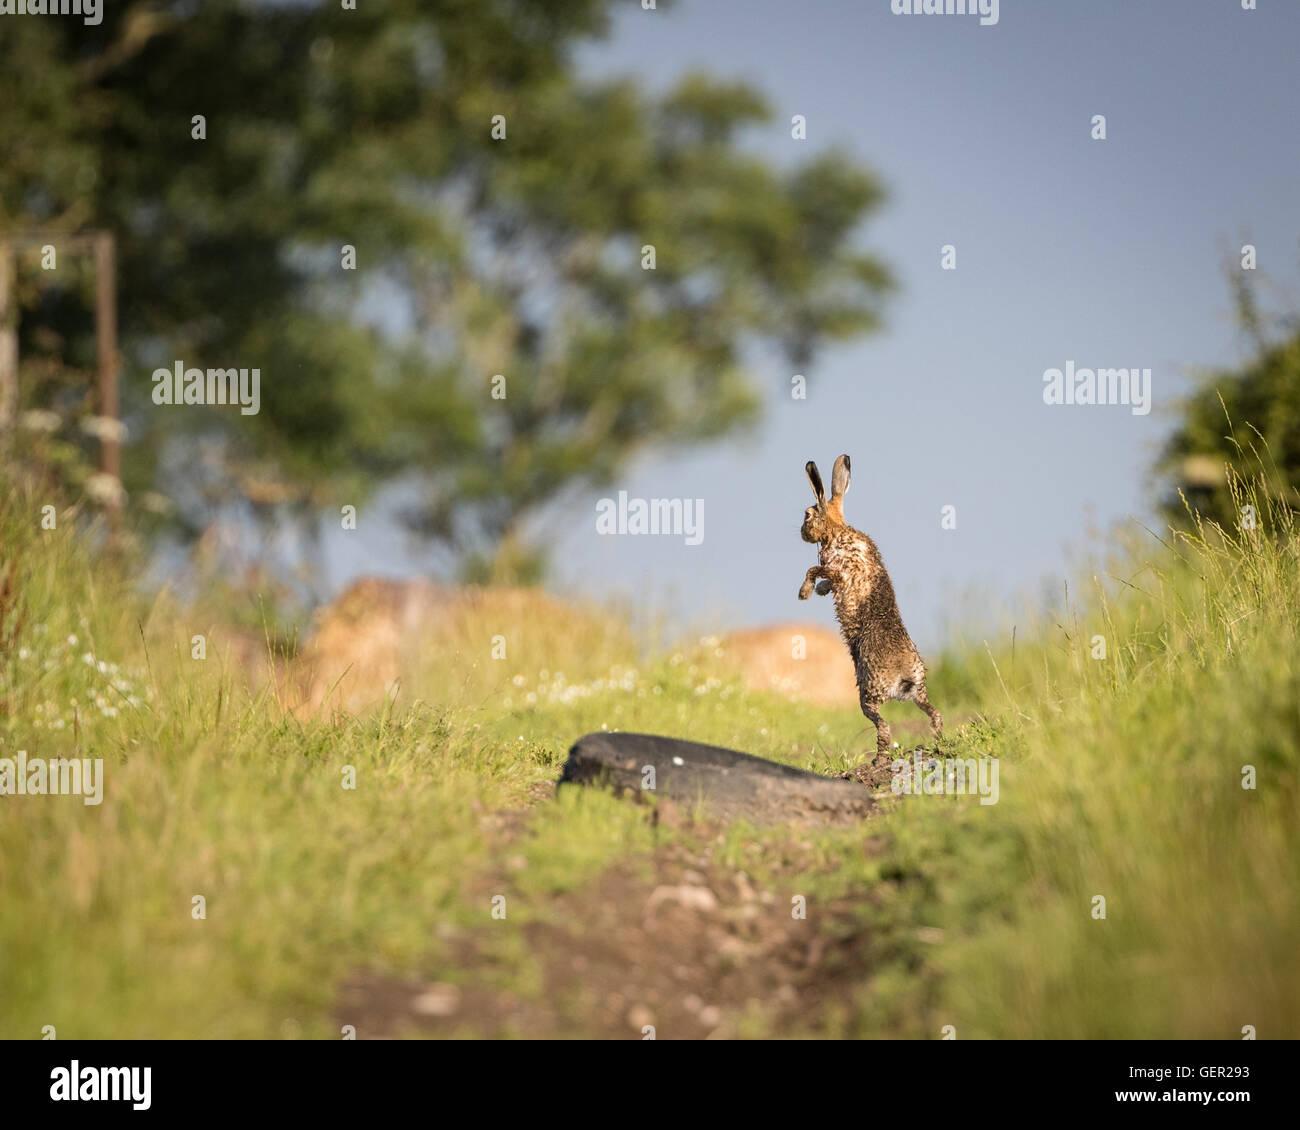 Brown Hare en ruta, en pleno salto, húmedo de bañarse en el charco (Lepus europaeus) Imagen De Stock